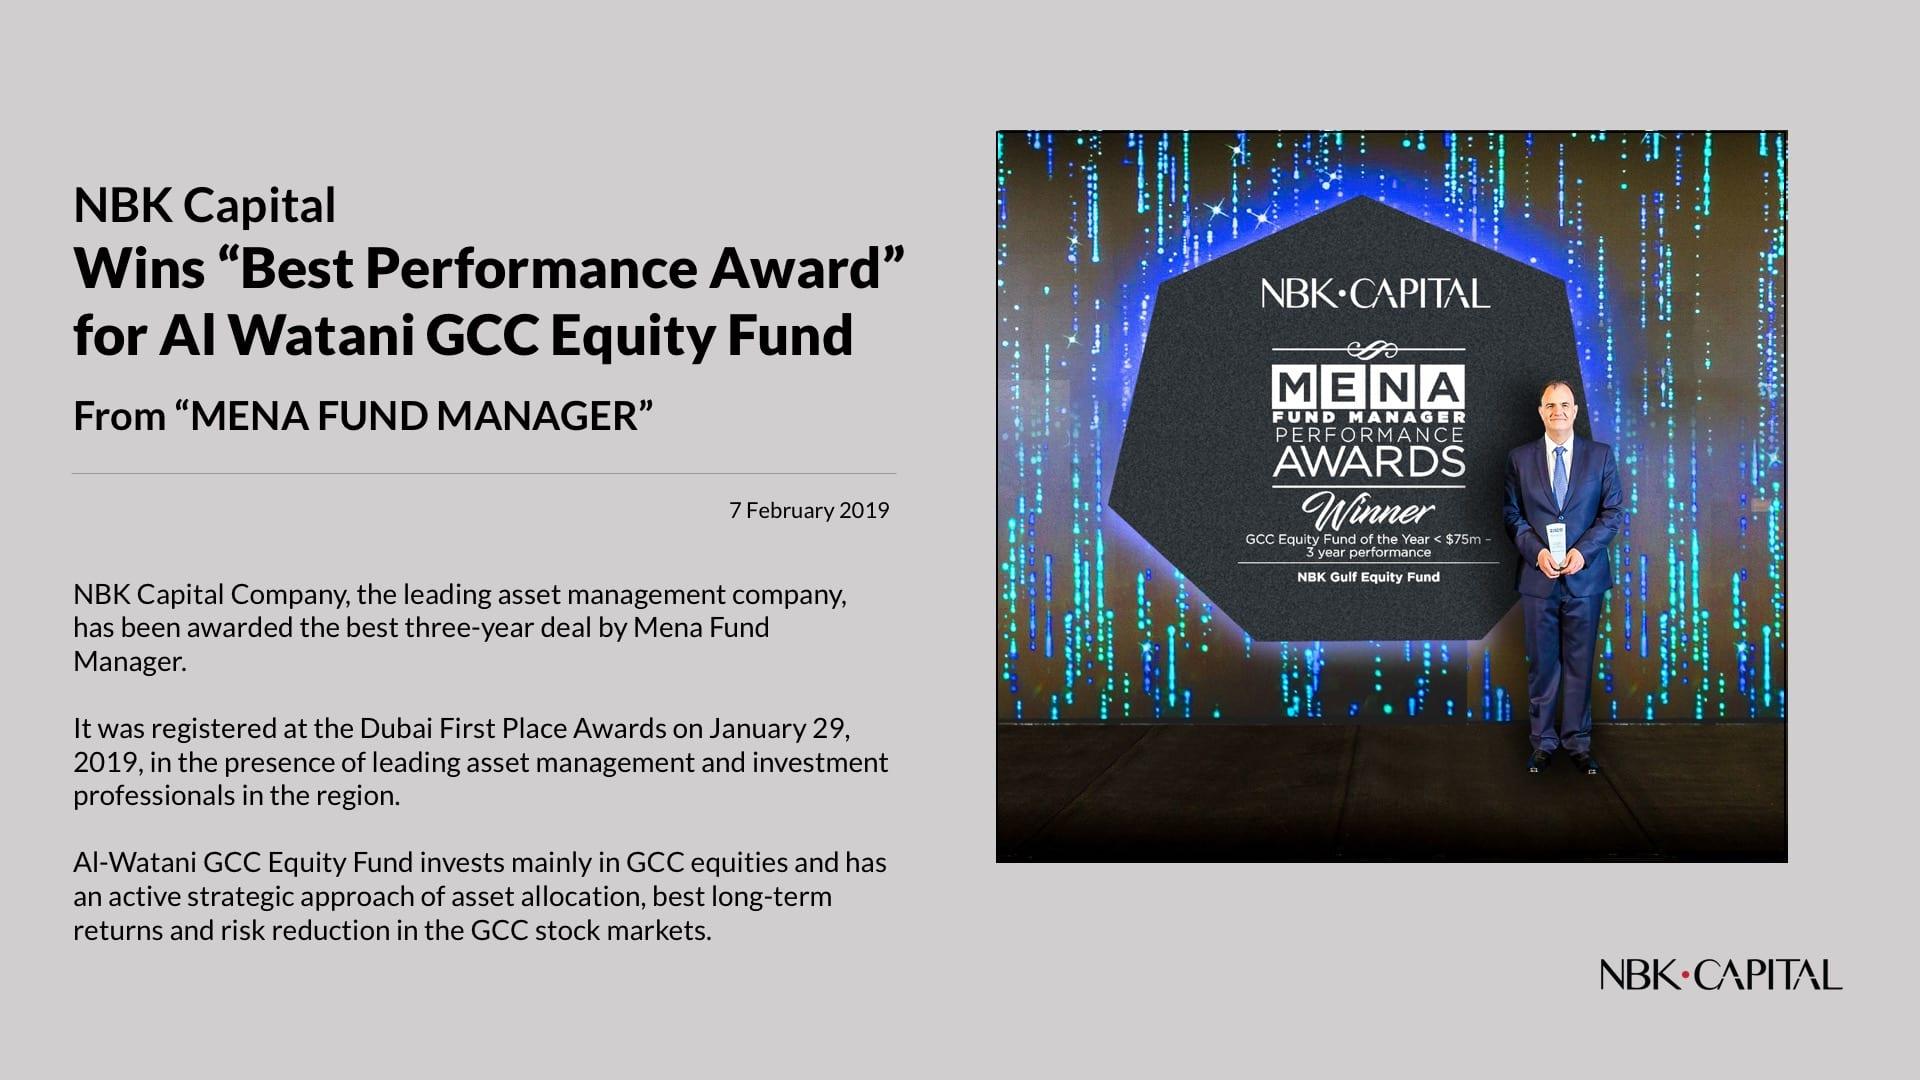 NBK Capital 'wins Best Performance Award' for Al-Watani Equity Fund